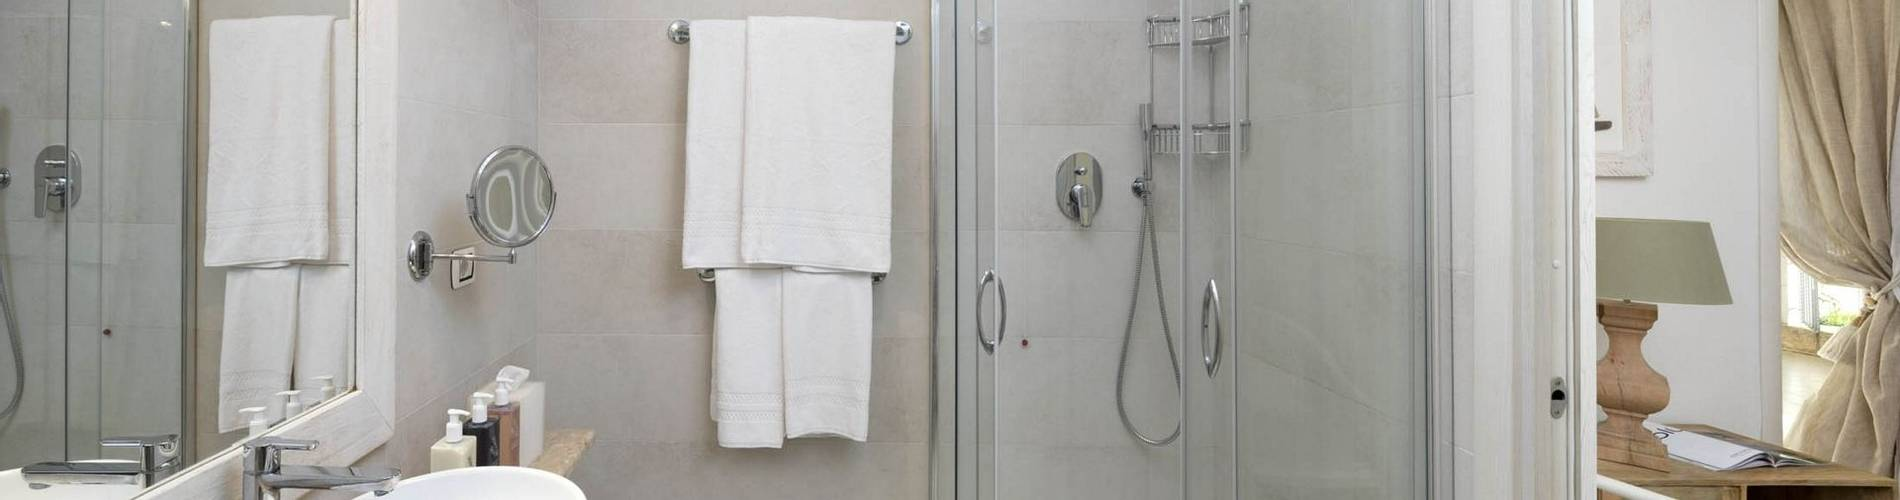 Charming Suite -bathroom- Gabbiano Azzurro Hotel _ Suites Sardegna - stampa.jpg